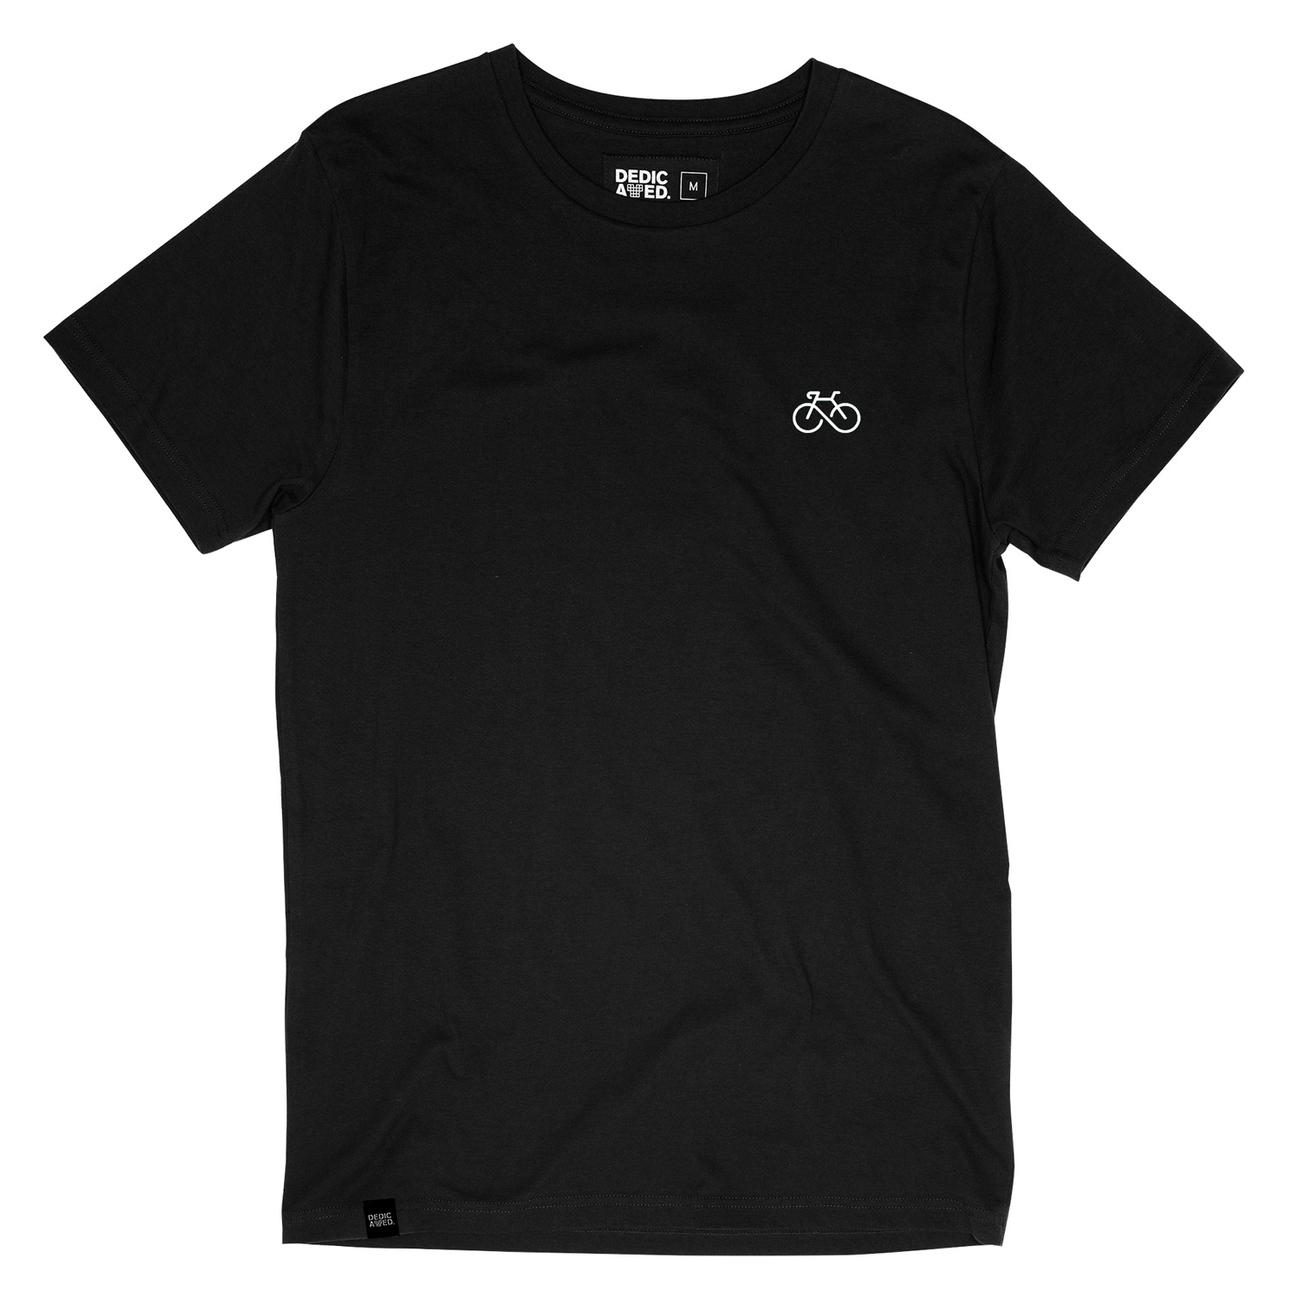 T-shirt Stockholm Infinity Bike